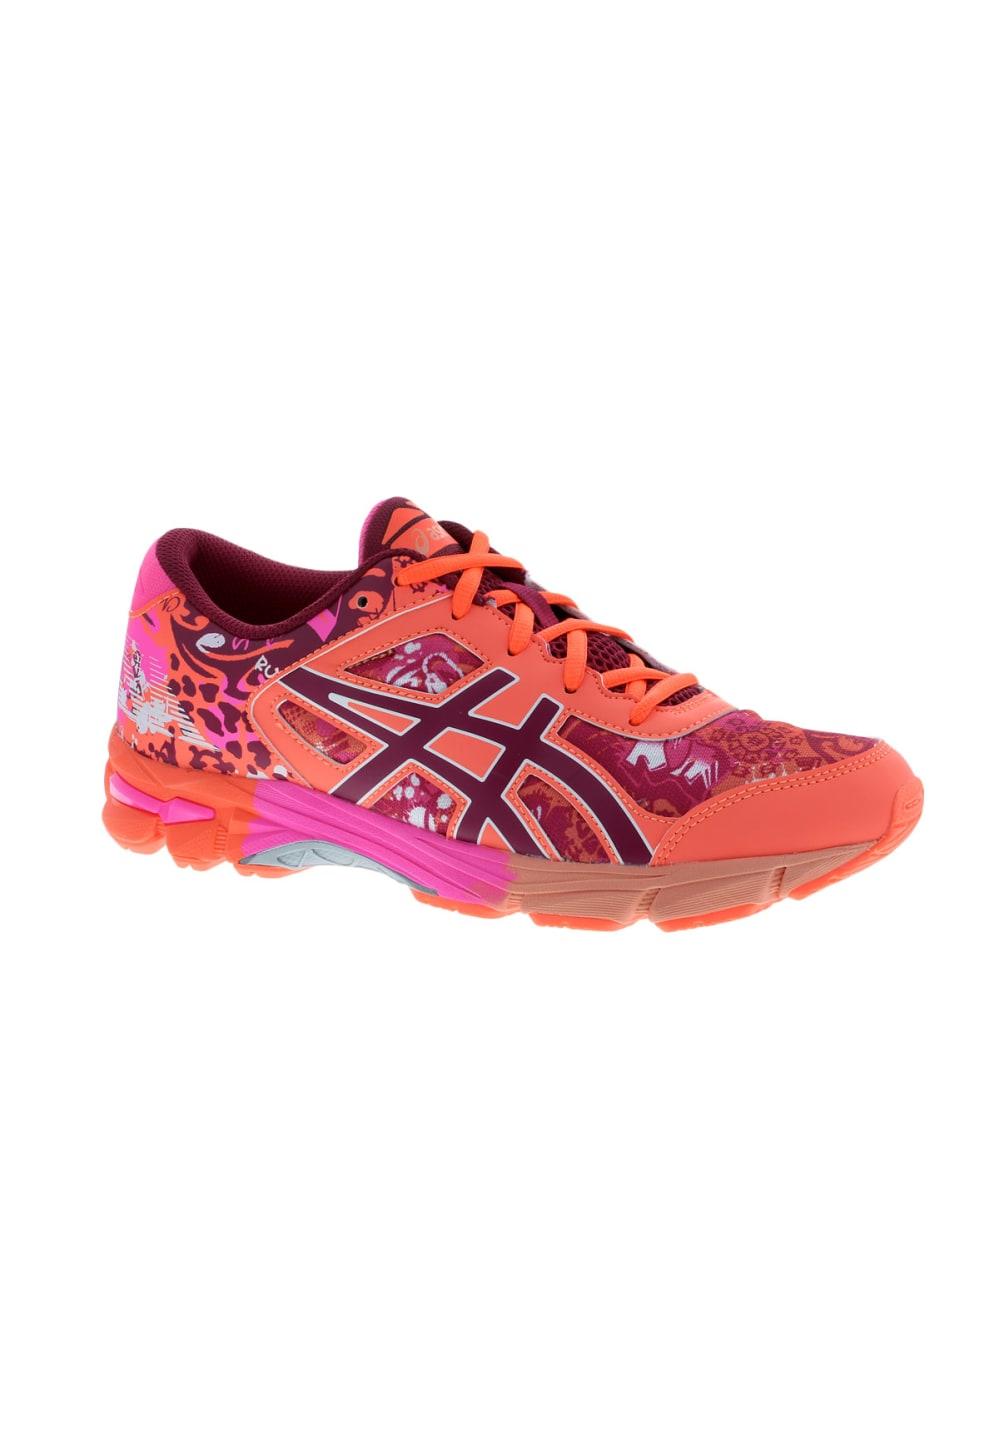 Noosa 11 Gel Tri Asics Shoes Beige Gs 21run Running 6qwAxxZa 04a6678dbf8